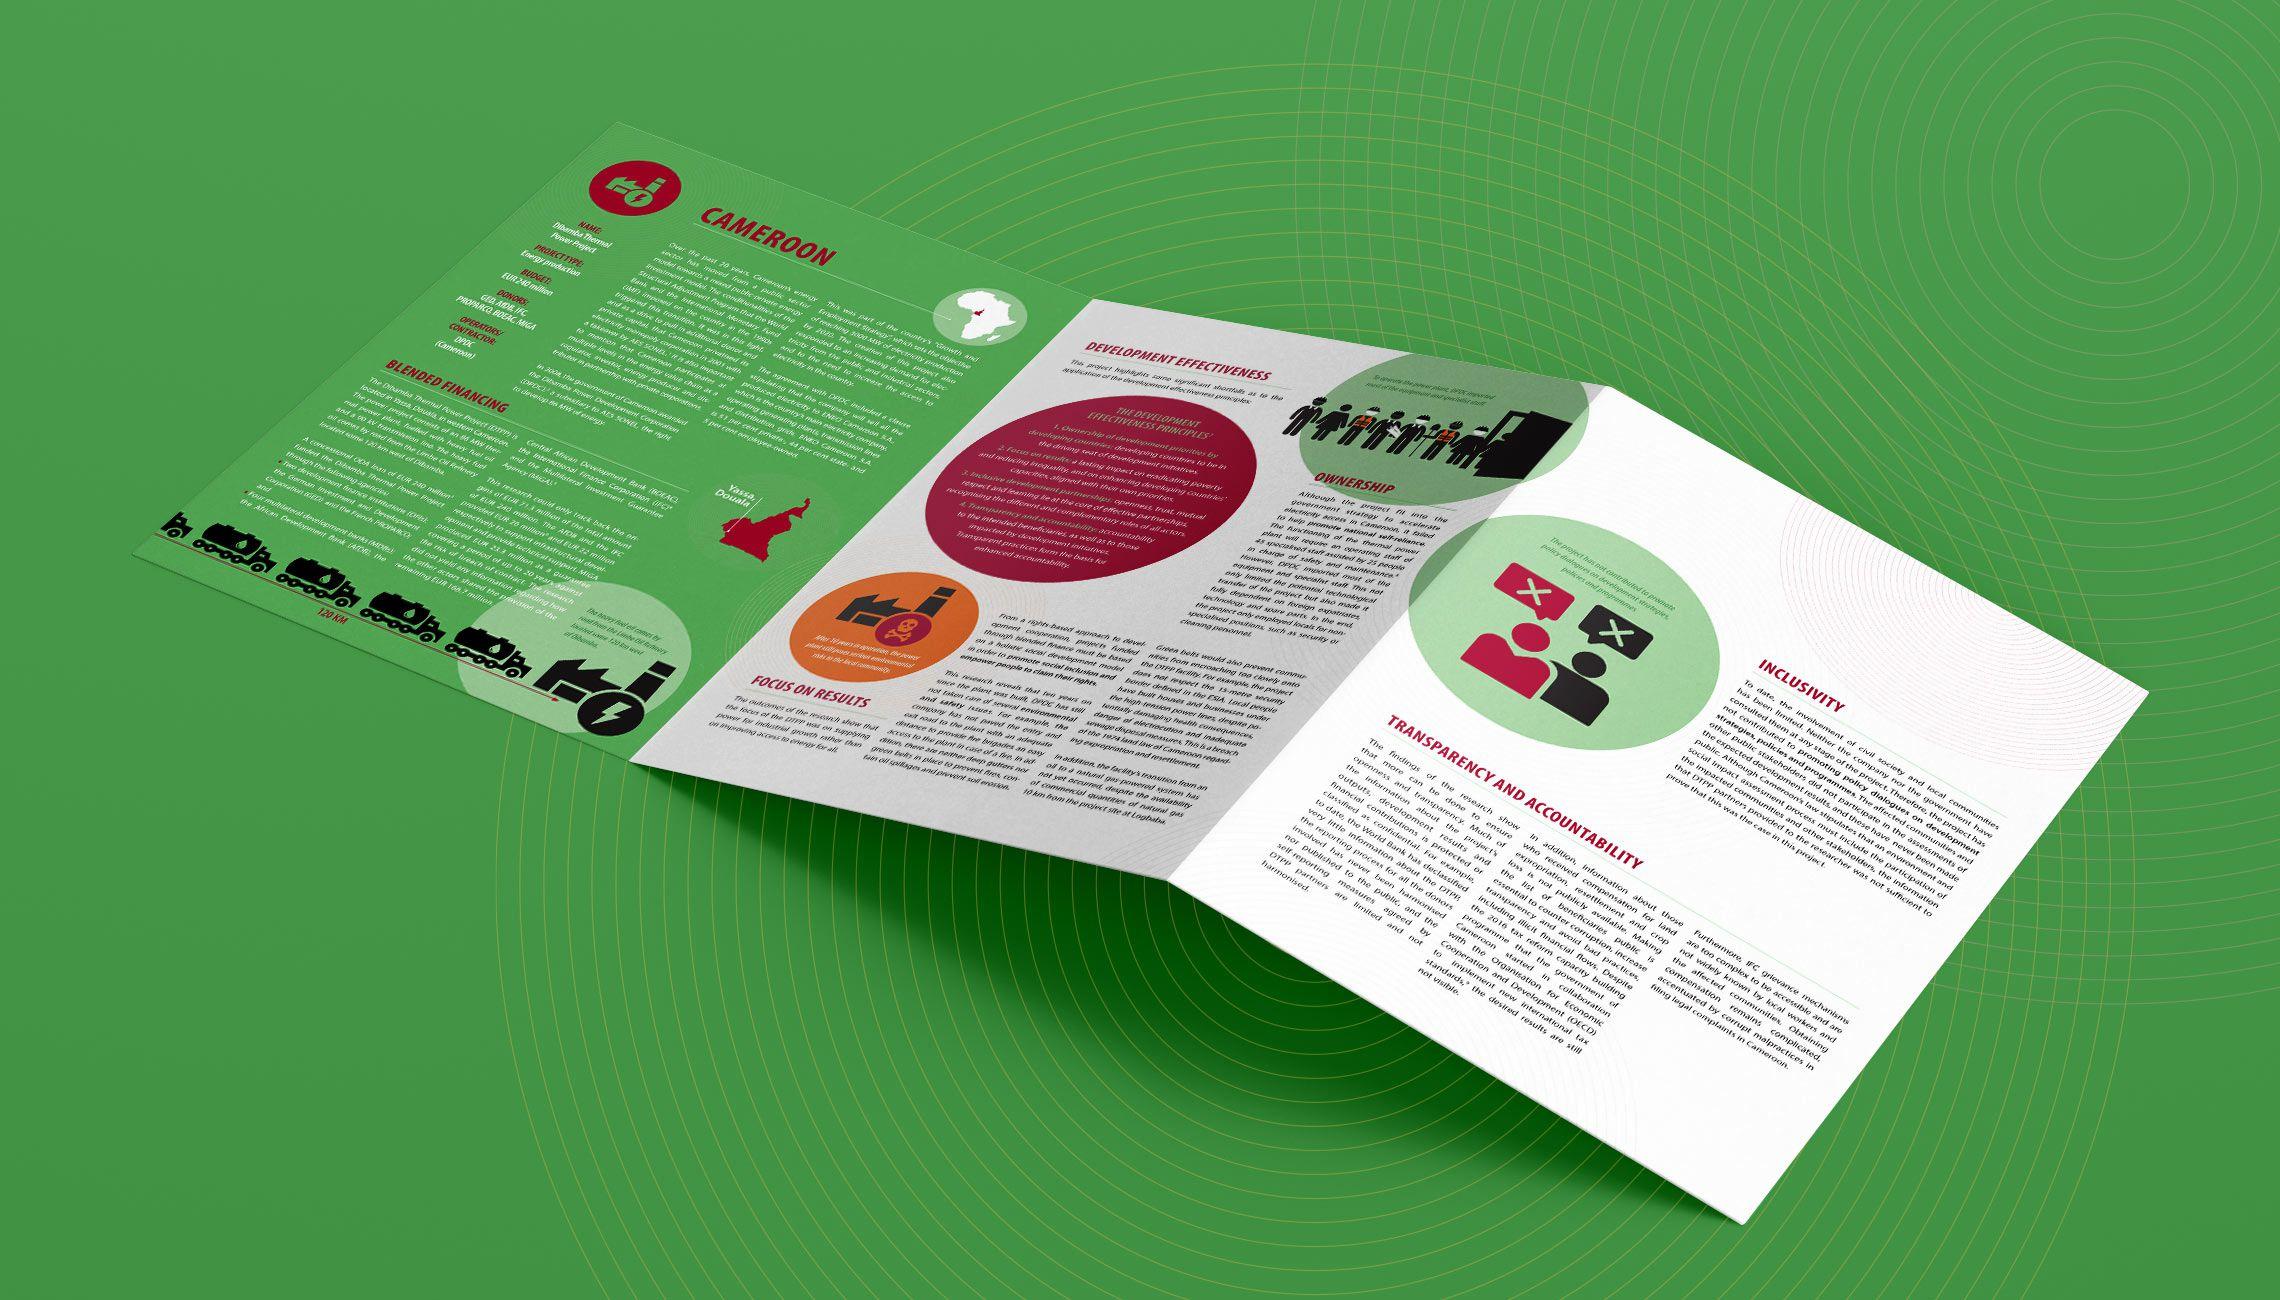 publication: SDGs and development programs impact reports - image 1